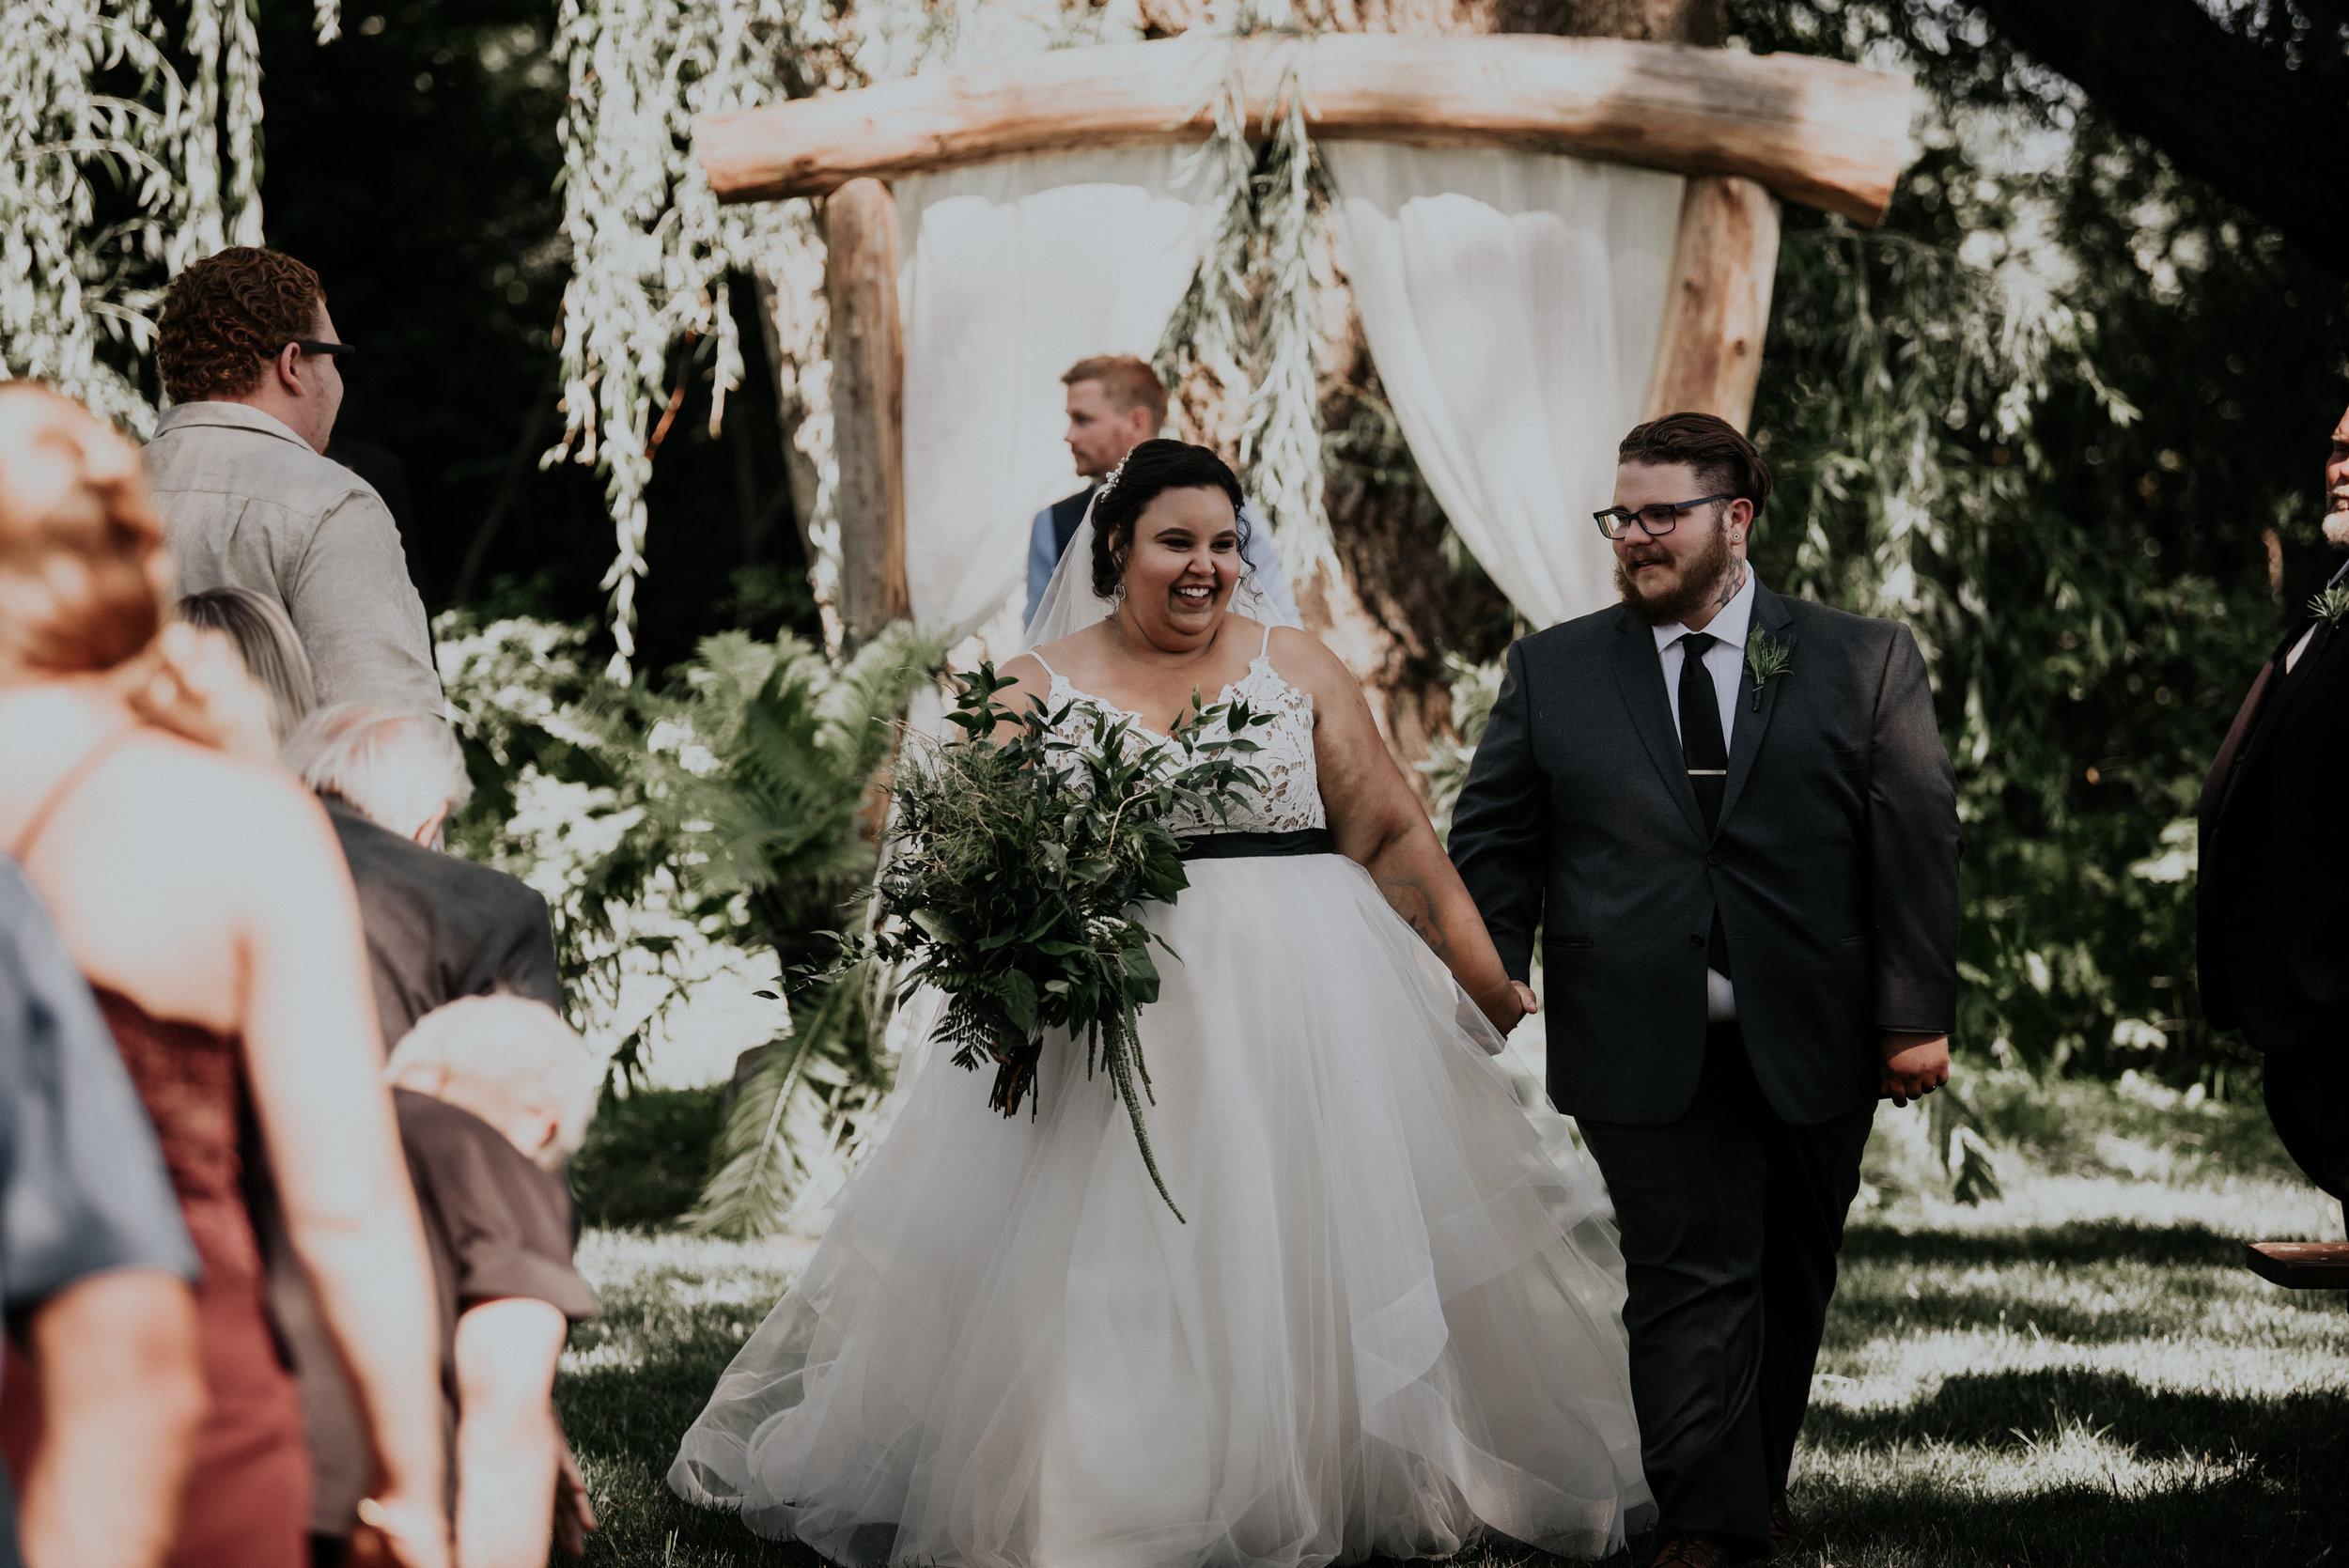 BridesbyYoung-RealWedding-PlusSizeBridal-BillyCourtney-JurassicParkTheme-29.jpg